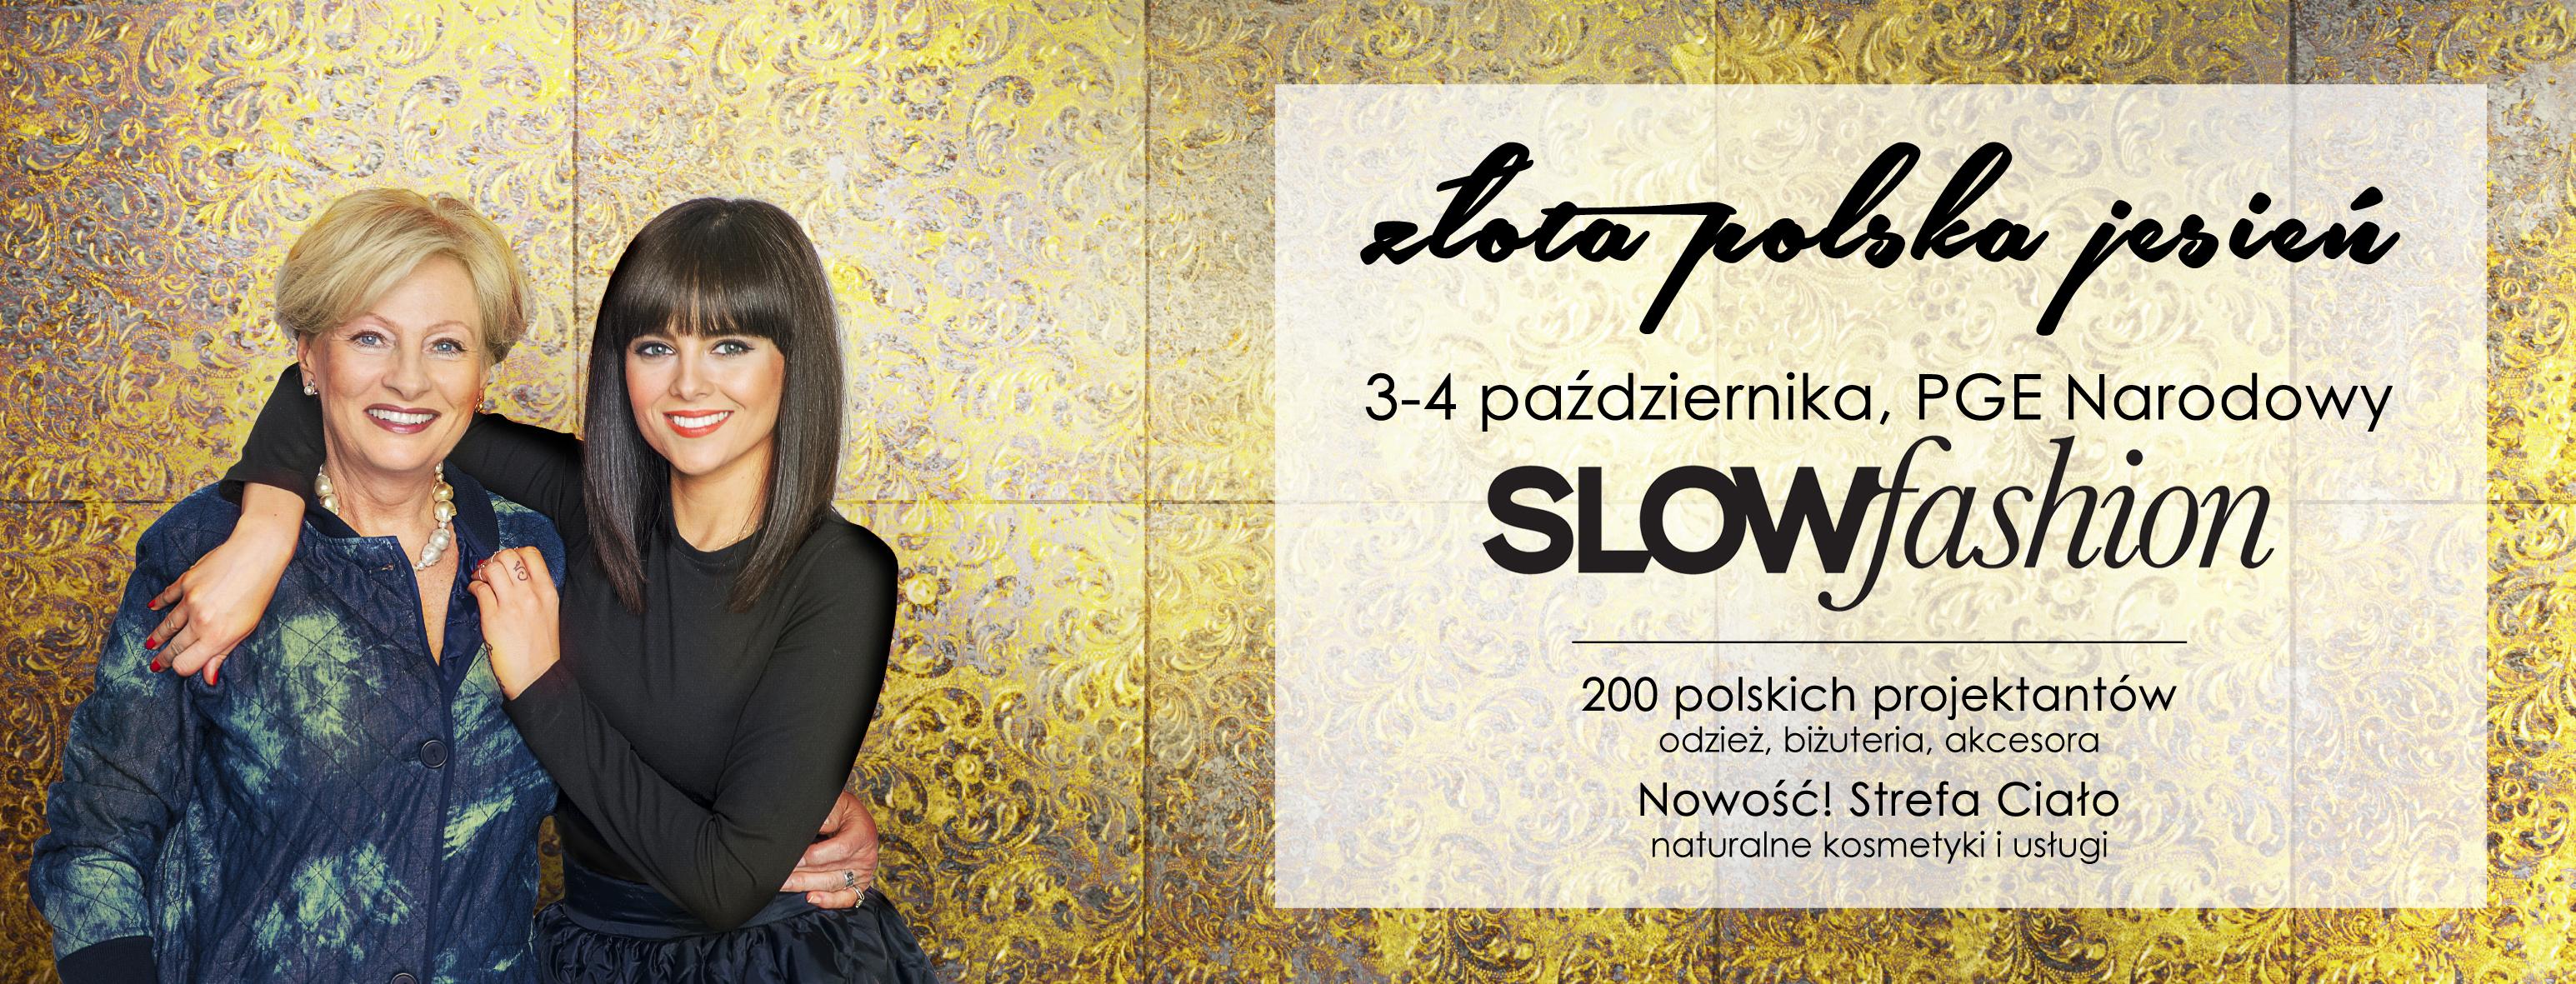 Slow Fashion #4 Zlota #Polska Jesien